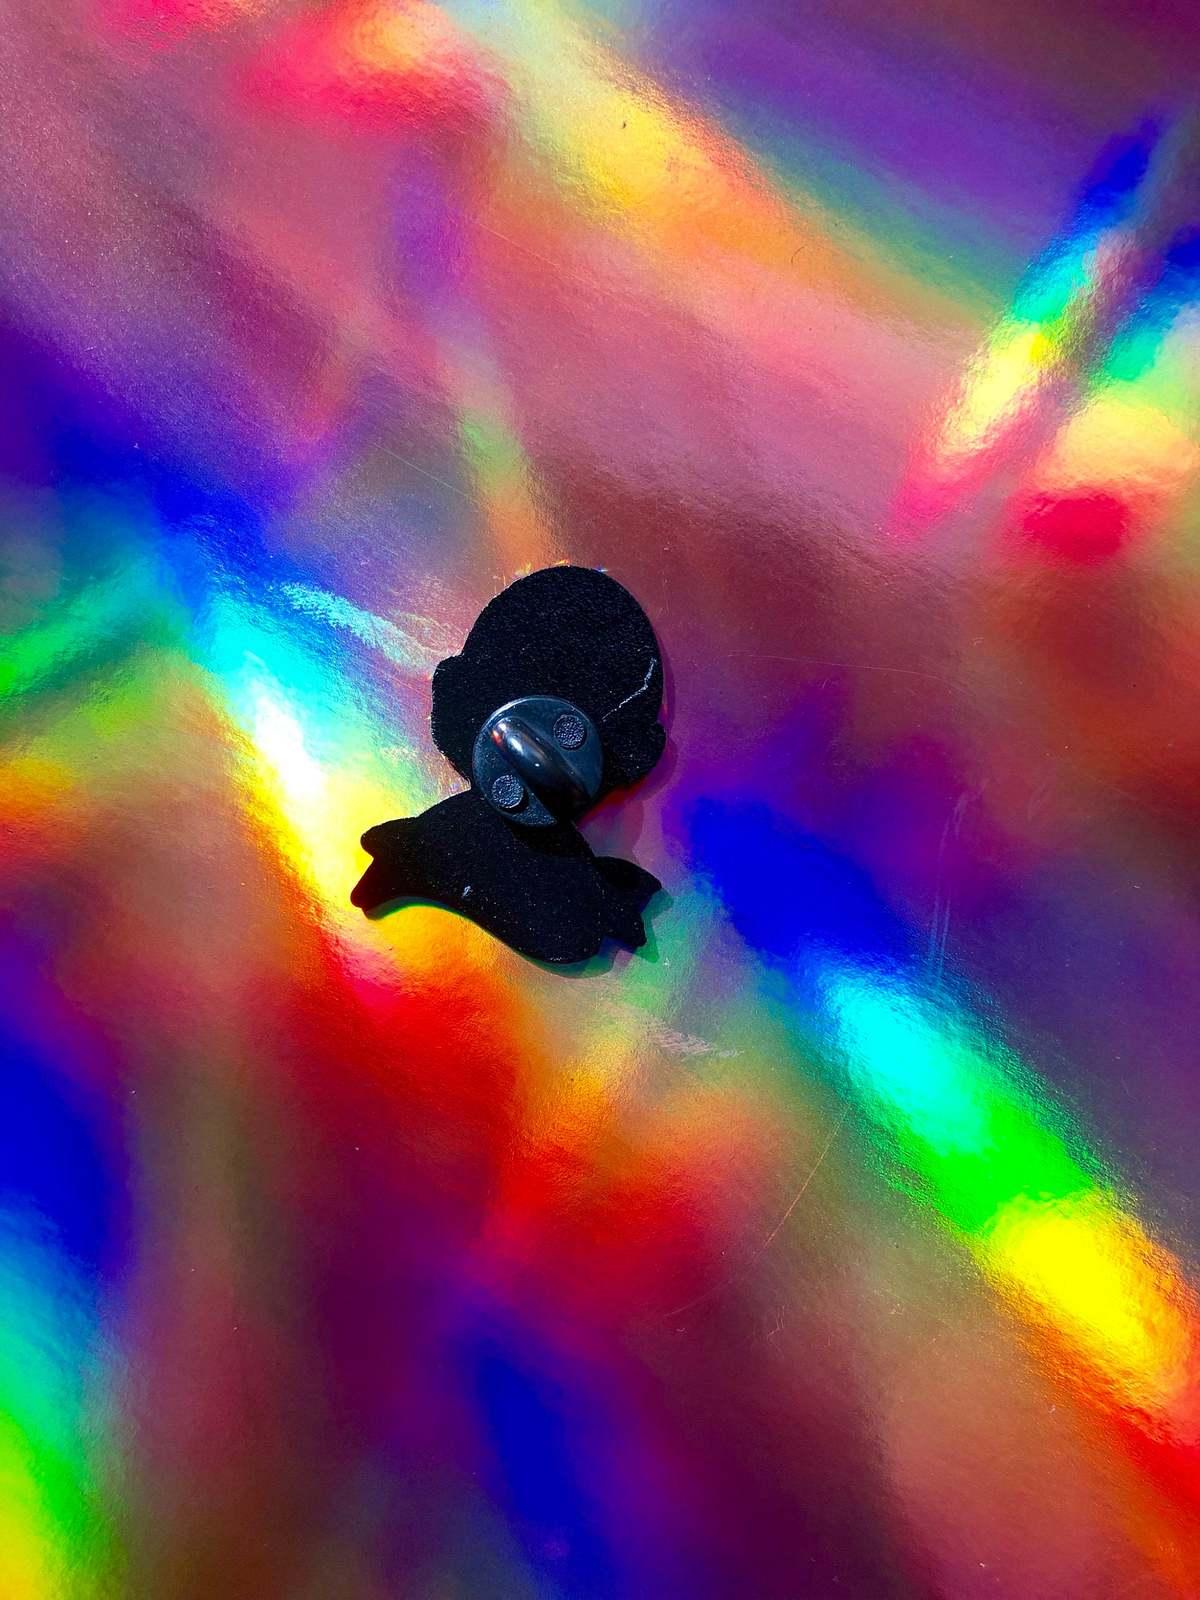 I dissent enamel pin / female empowerment pin / ruth ginsburg /ruth ginsburg pin image 4